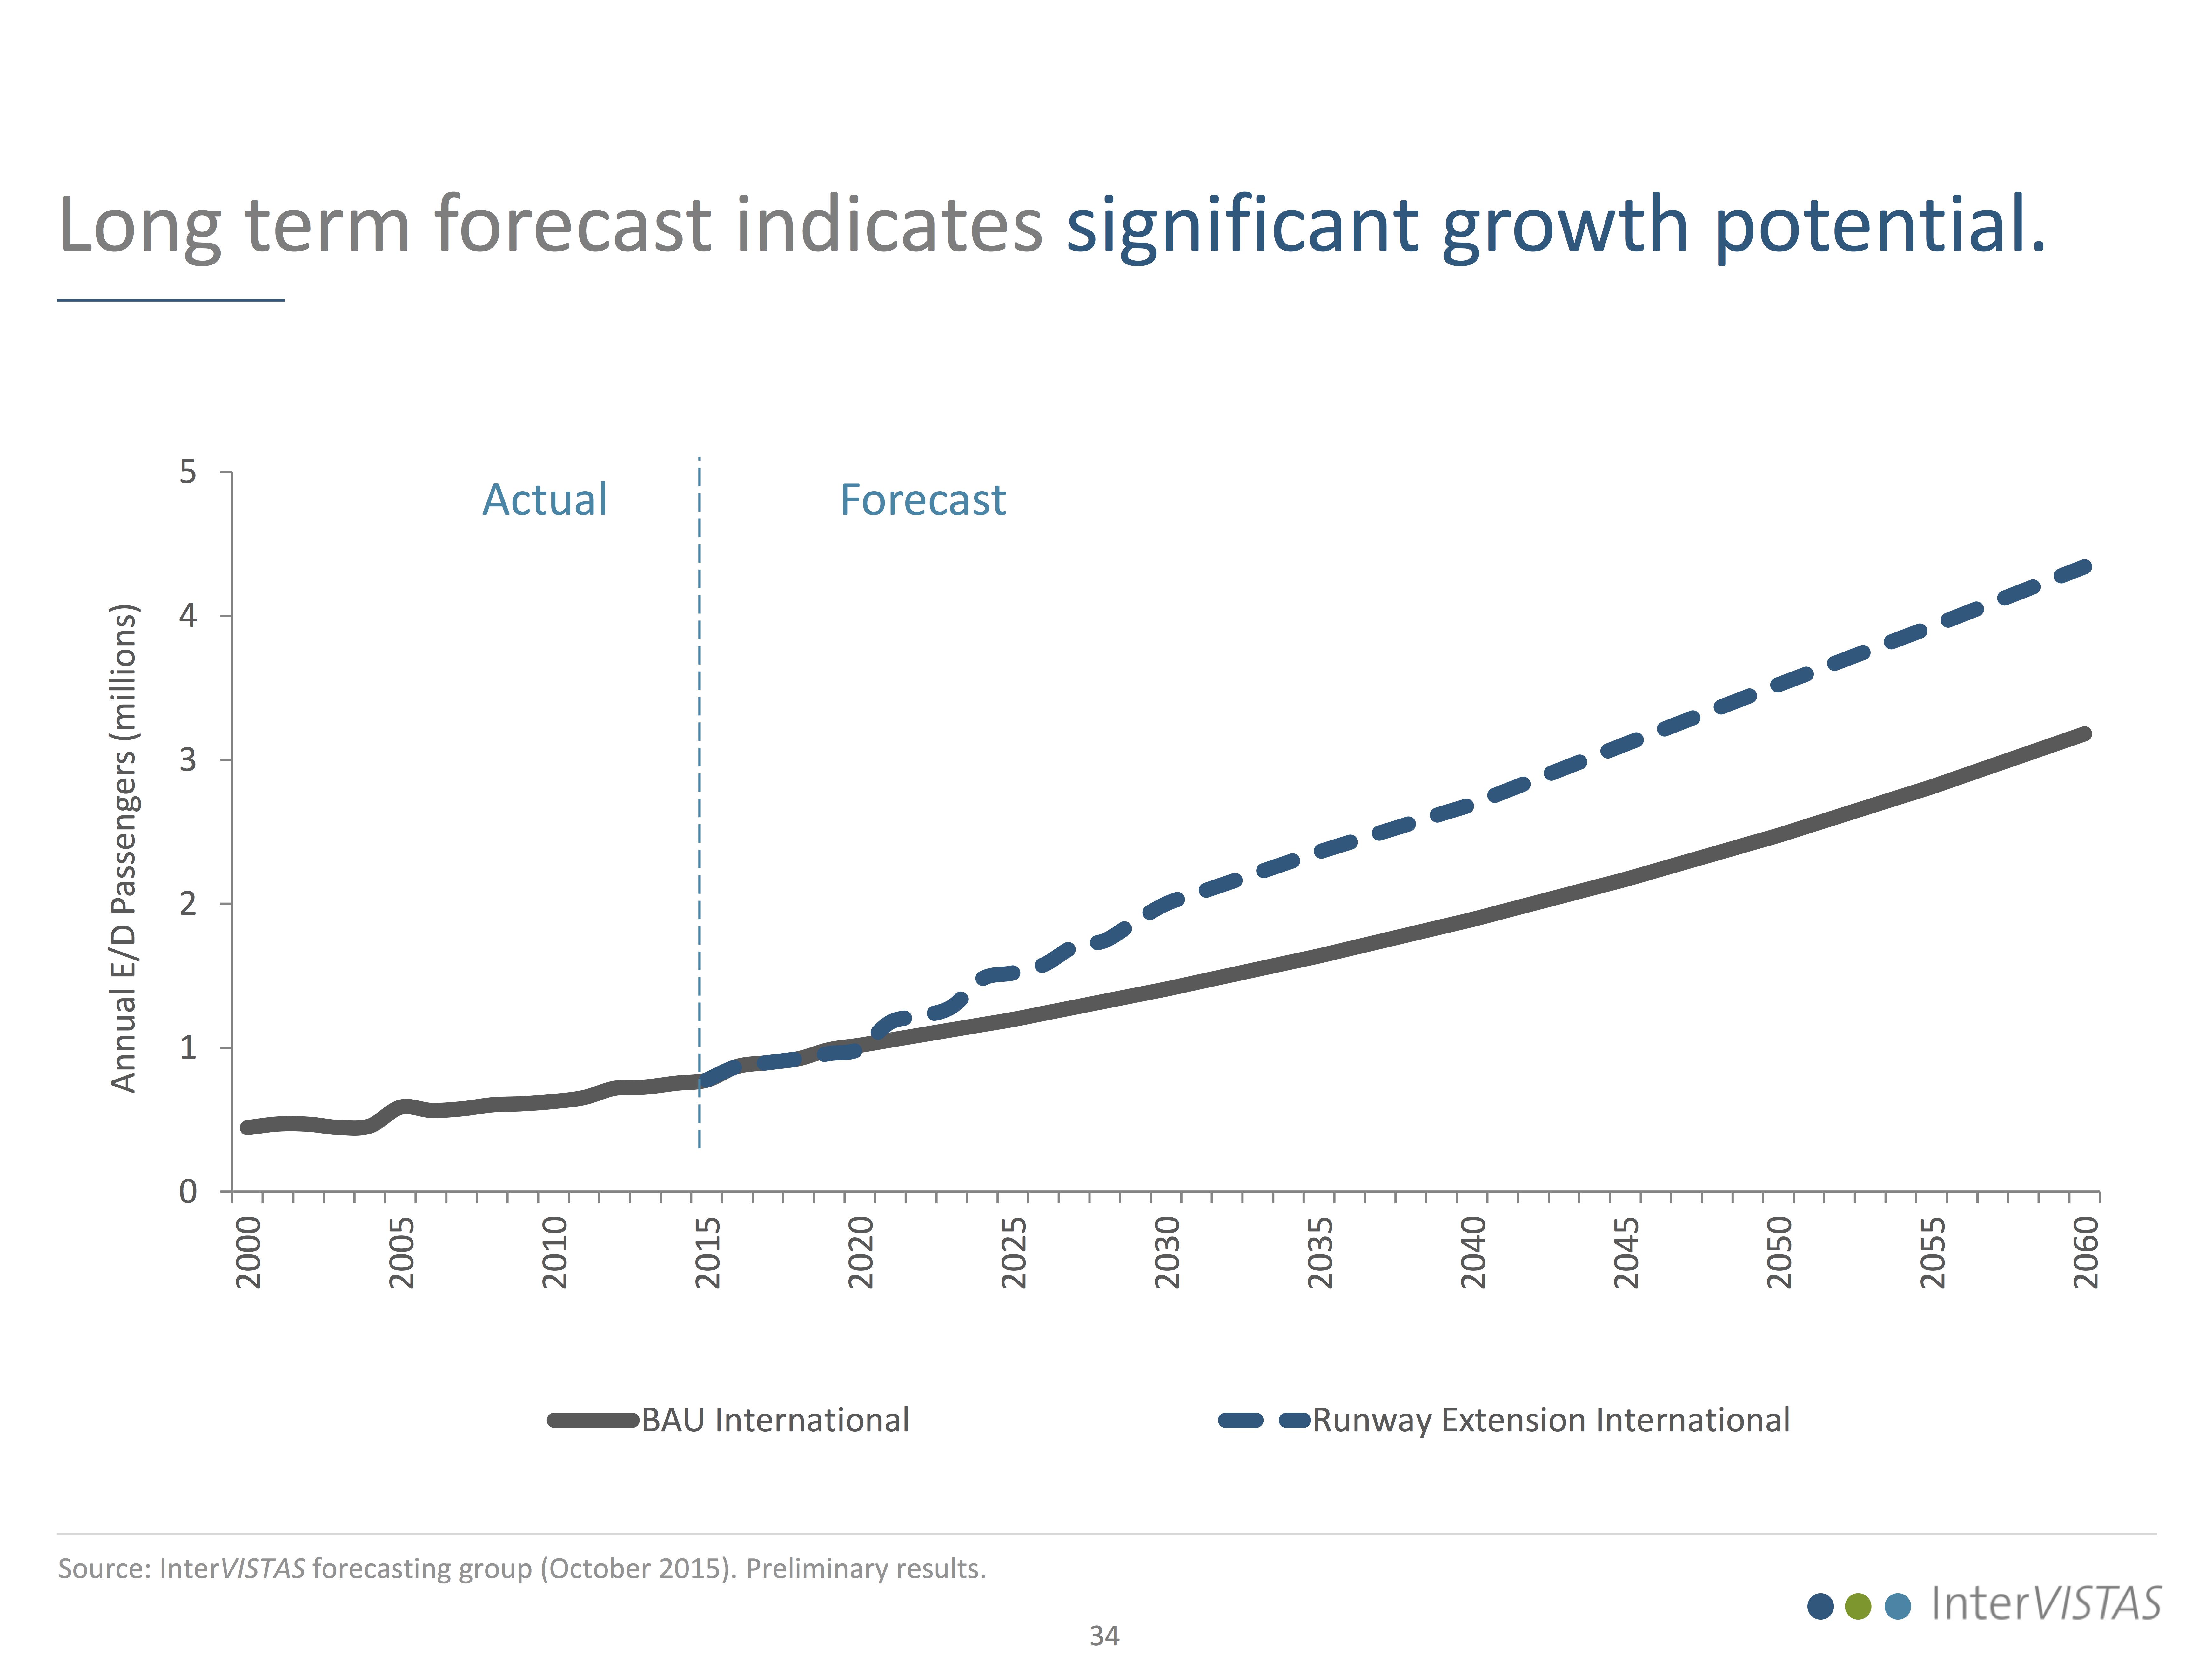 InterVISTAS LT forecast